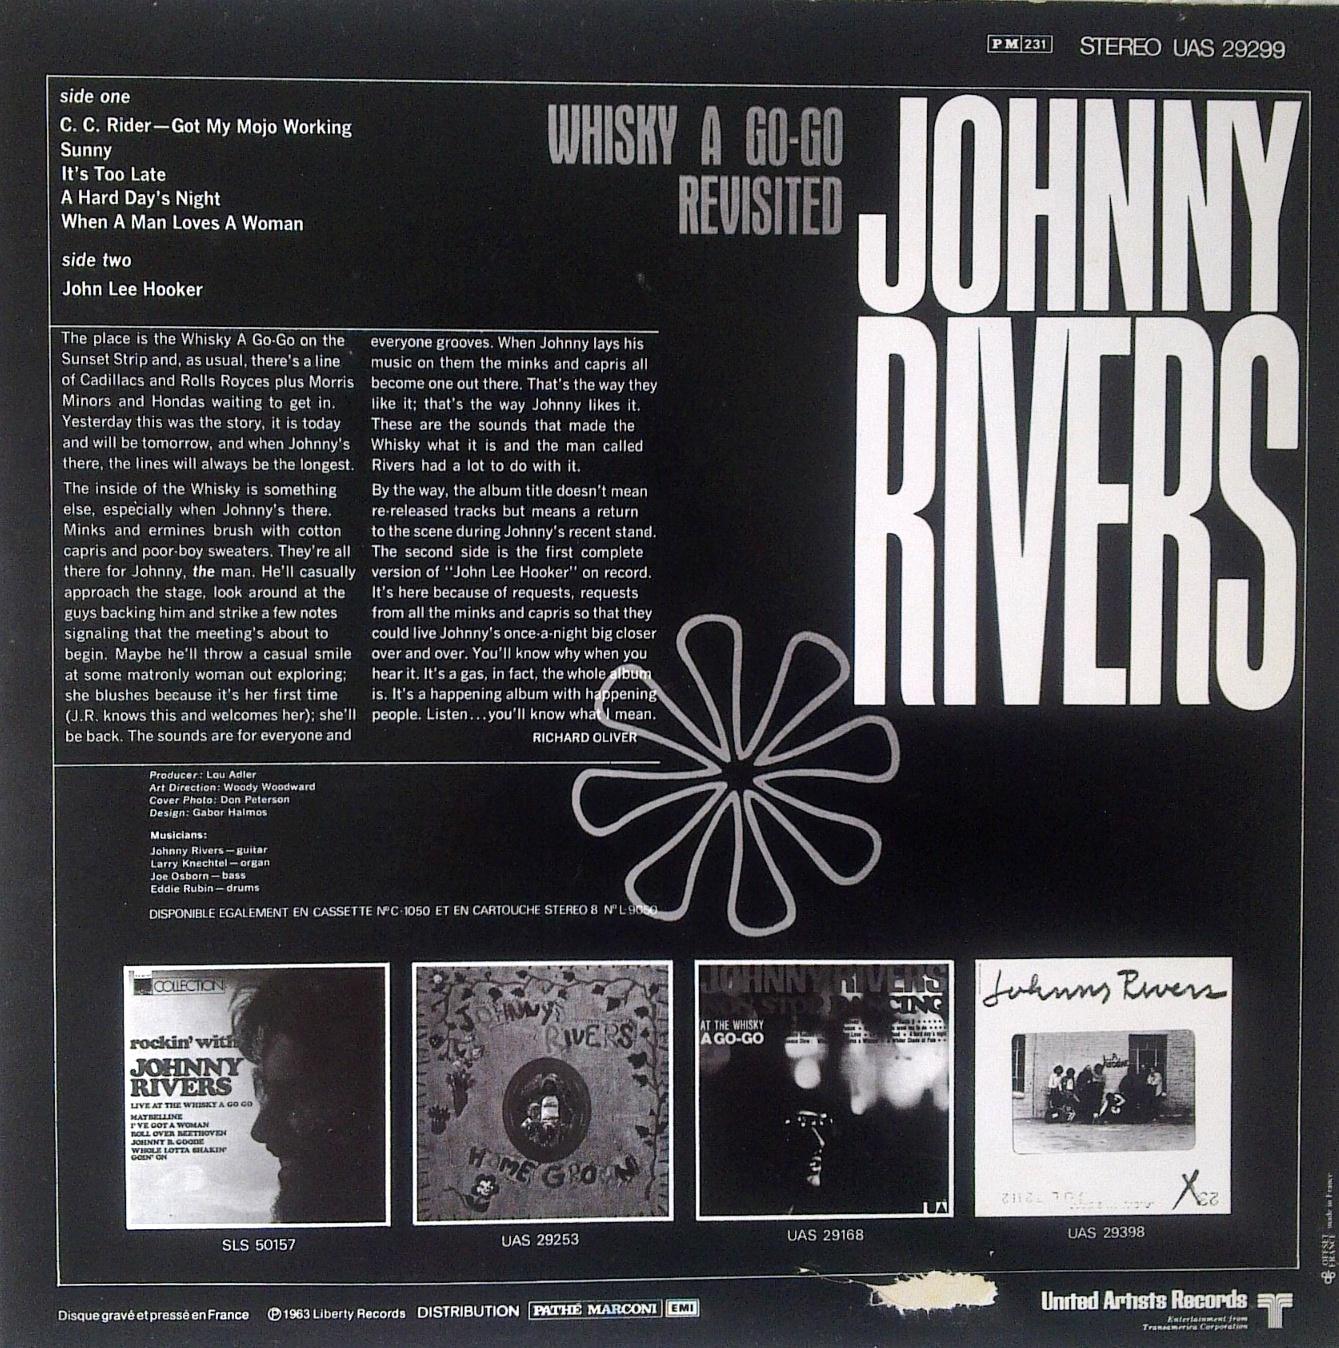 Une madeleine auditive: Johnny Rivers - John Lee Hooker (1967)